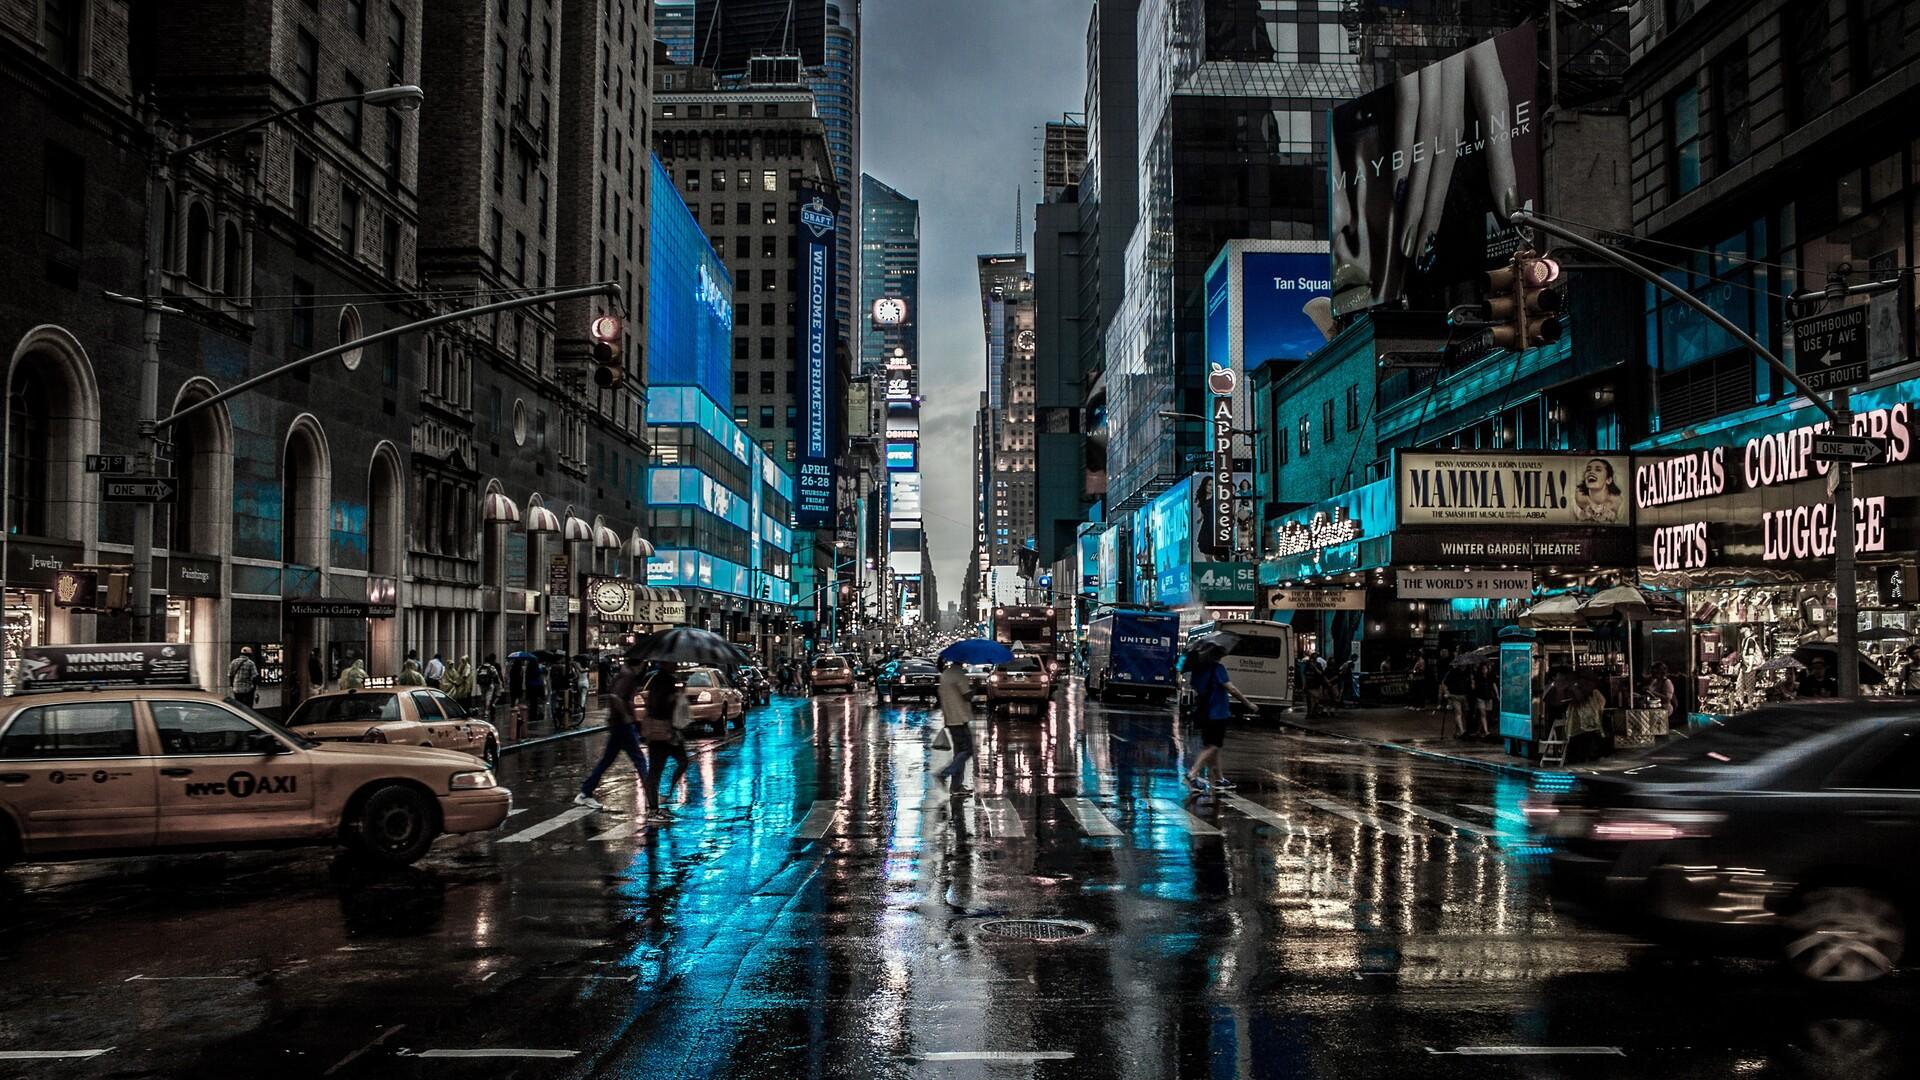 1920x1080 New York City Street Reflection Motion Blur Dark